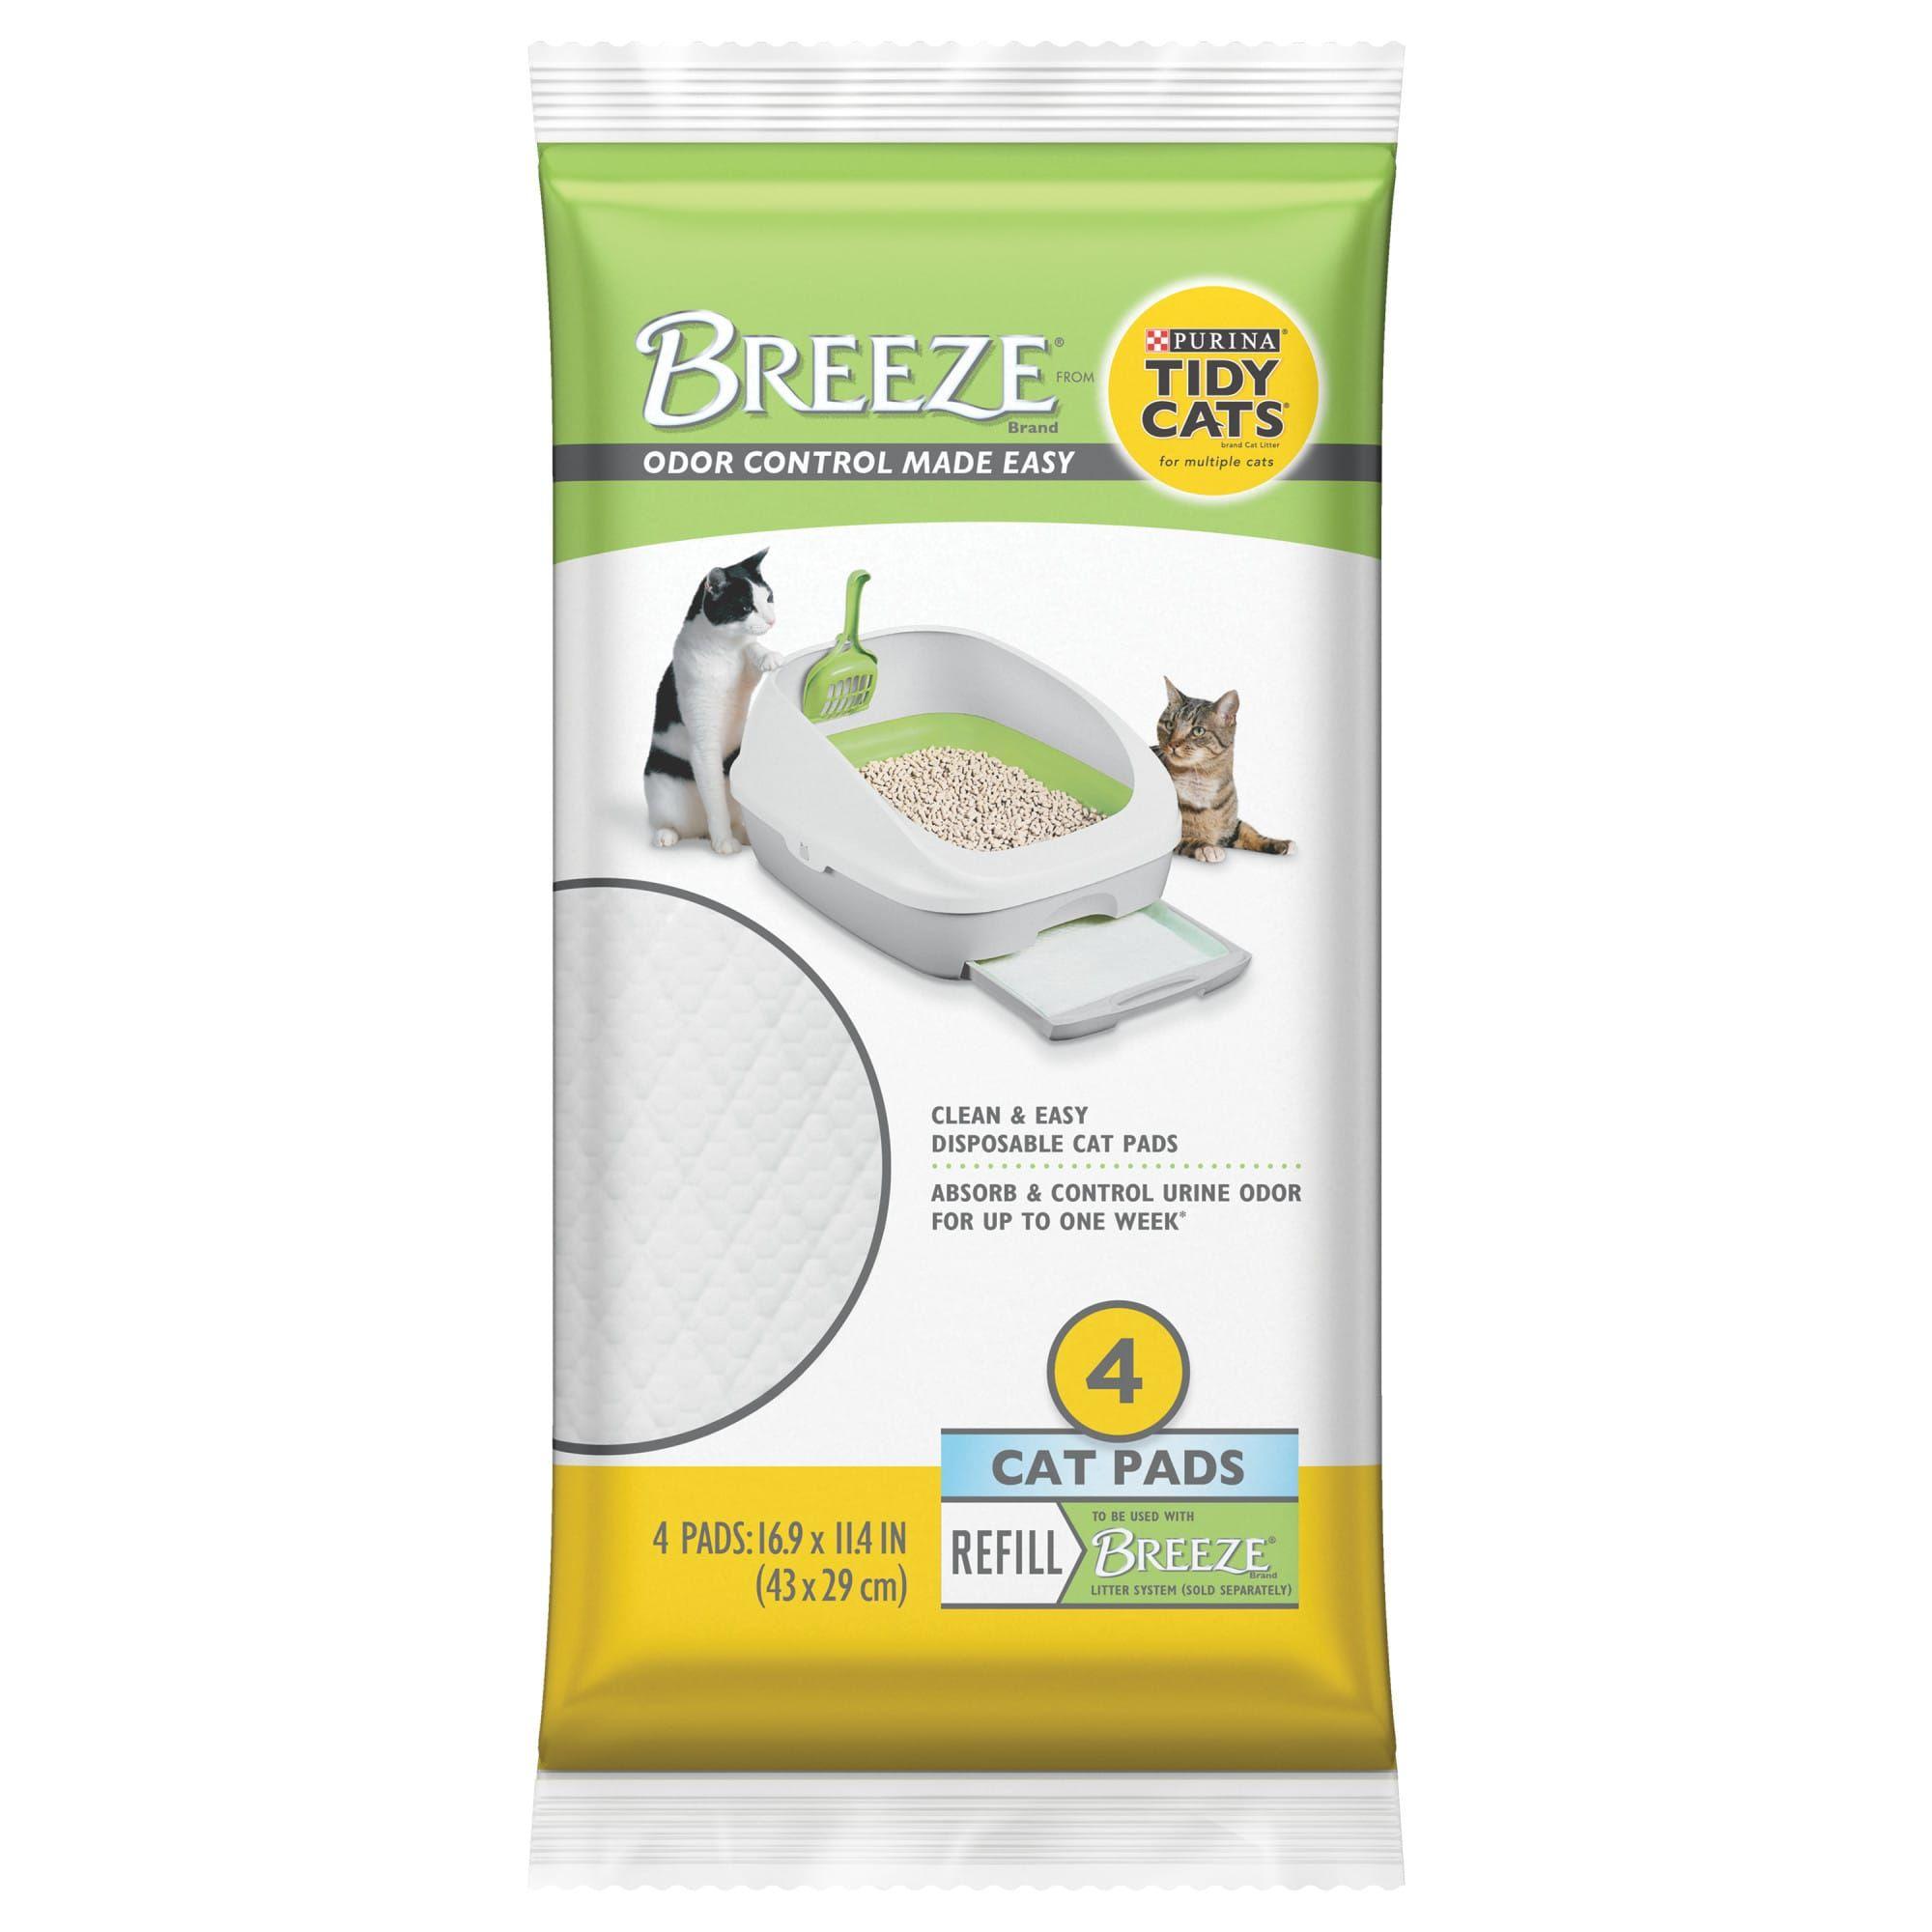 Purina Tidy Cats Breeze Cat Pads Refill Pack, 7.52 oz